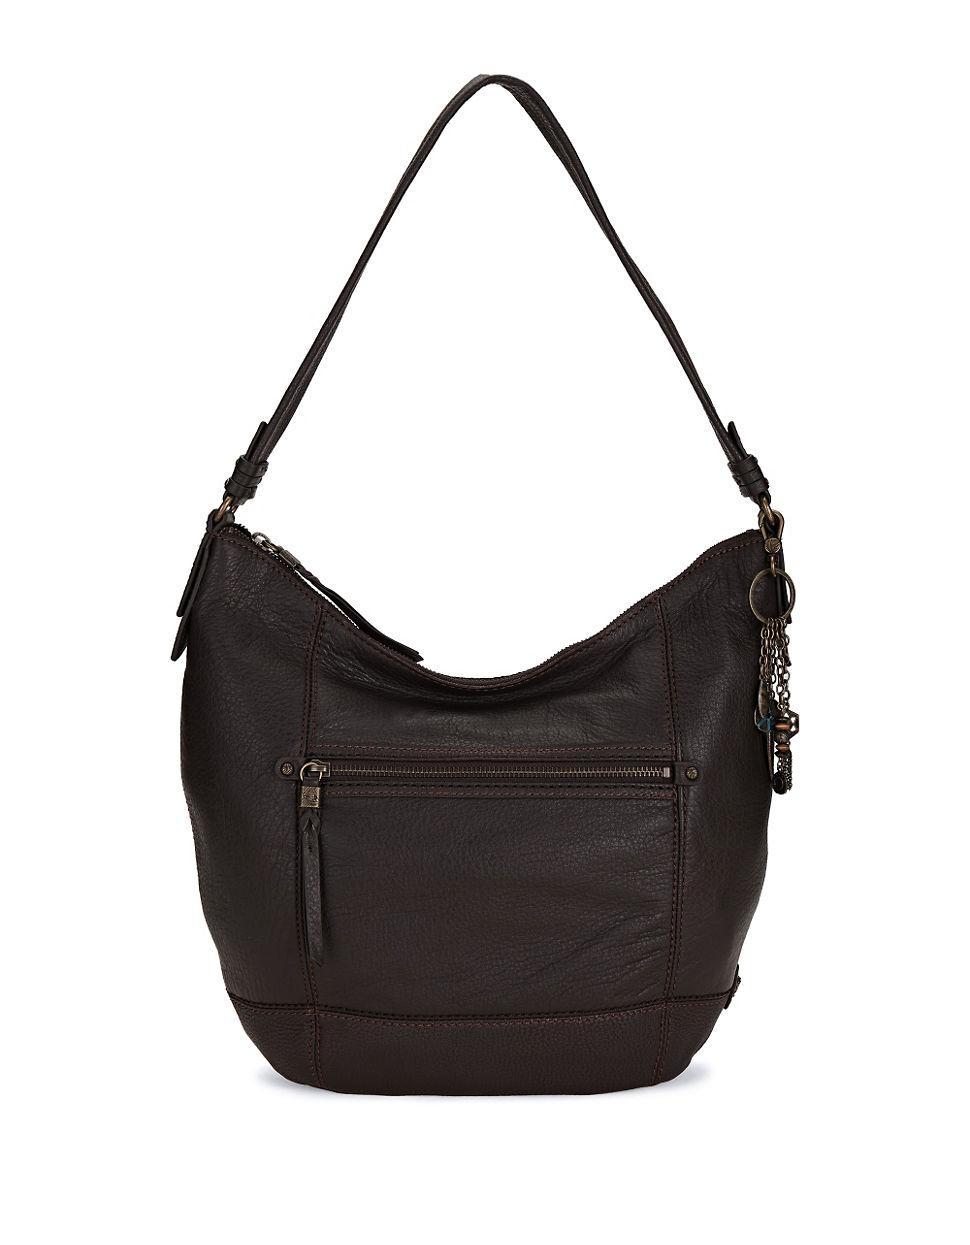 The Sak Sequoia Leather Hobo Bag In Black Lyst